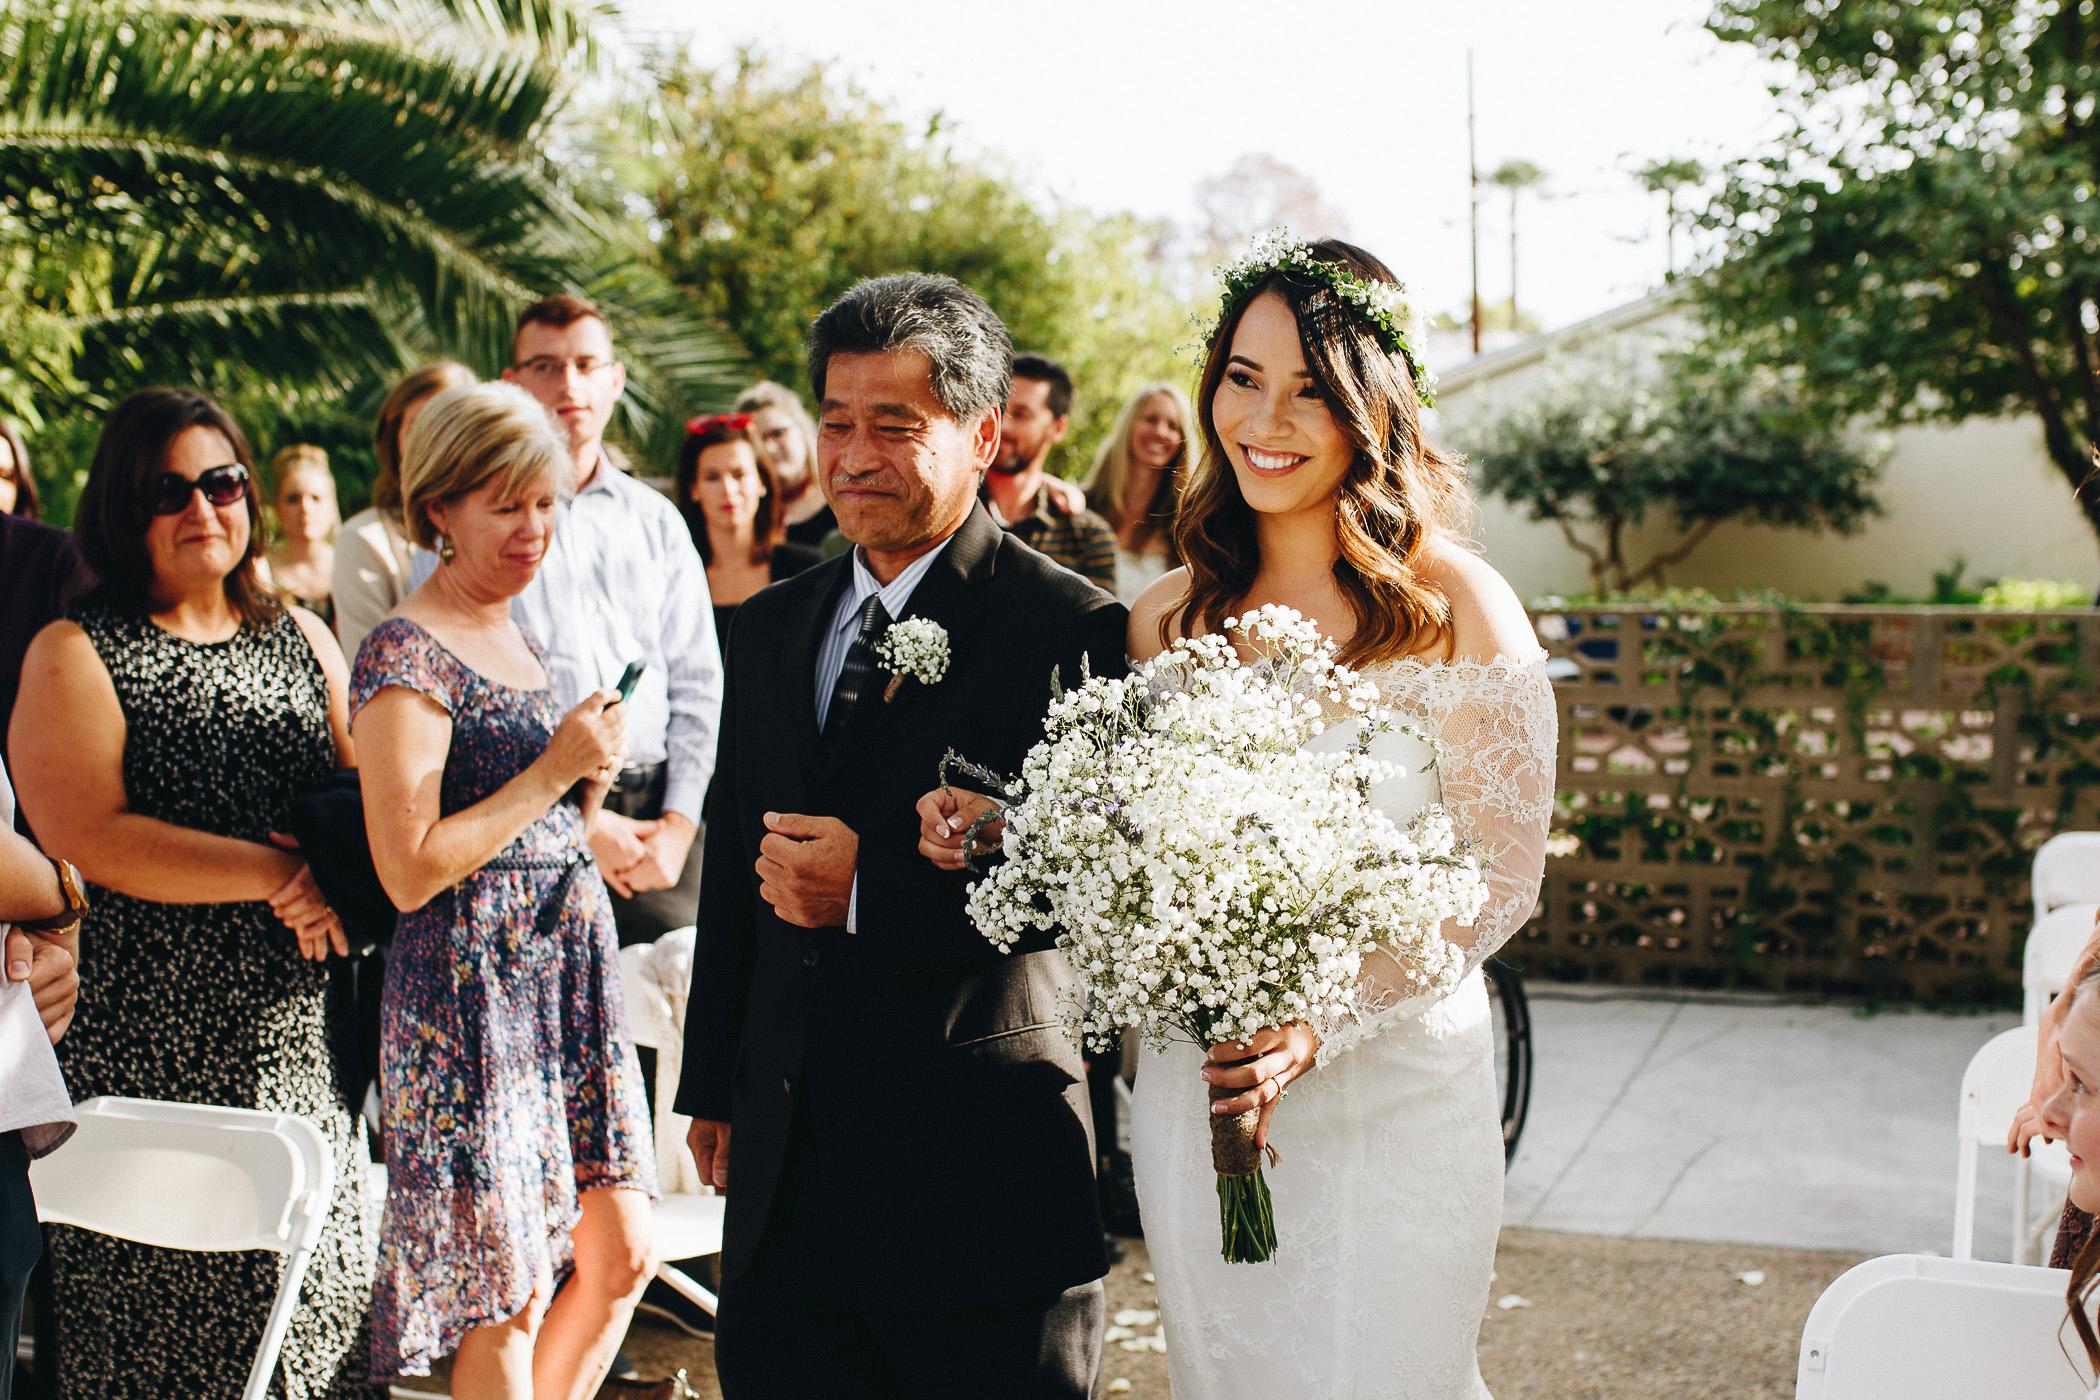 181104-Luxium-Weddings-Arizona-@matt__Le-Brandon-Kariana-Phoenix-Valley-Garden-Center-1050.jpg